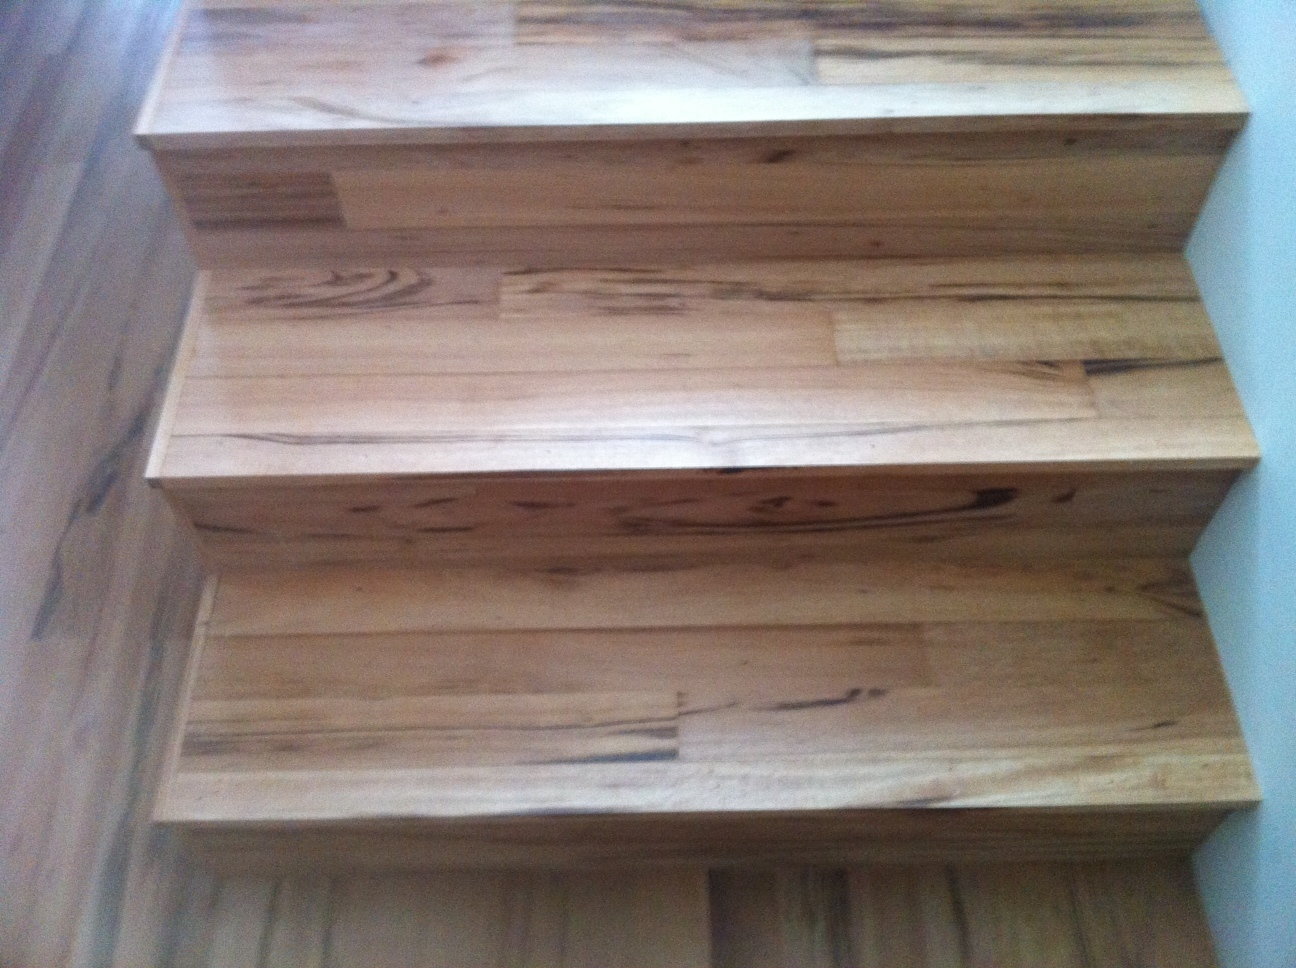 Stair Treads Using Flooring Stair Parts Blog | Oak Stair Treads For Sale | Hardwood Lumber | Risers | Wood Stair | Stair Parts | Wood